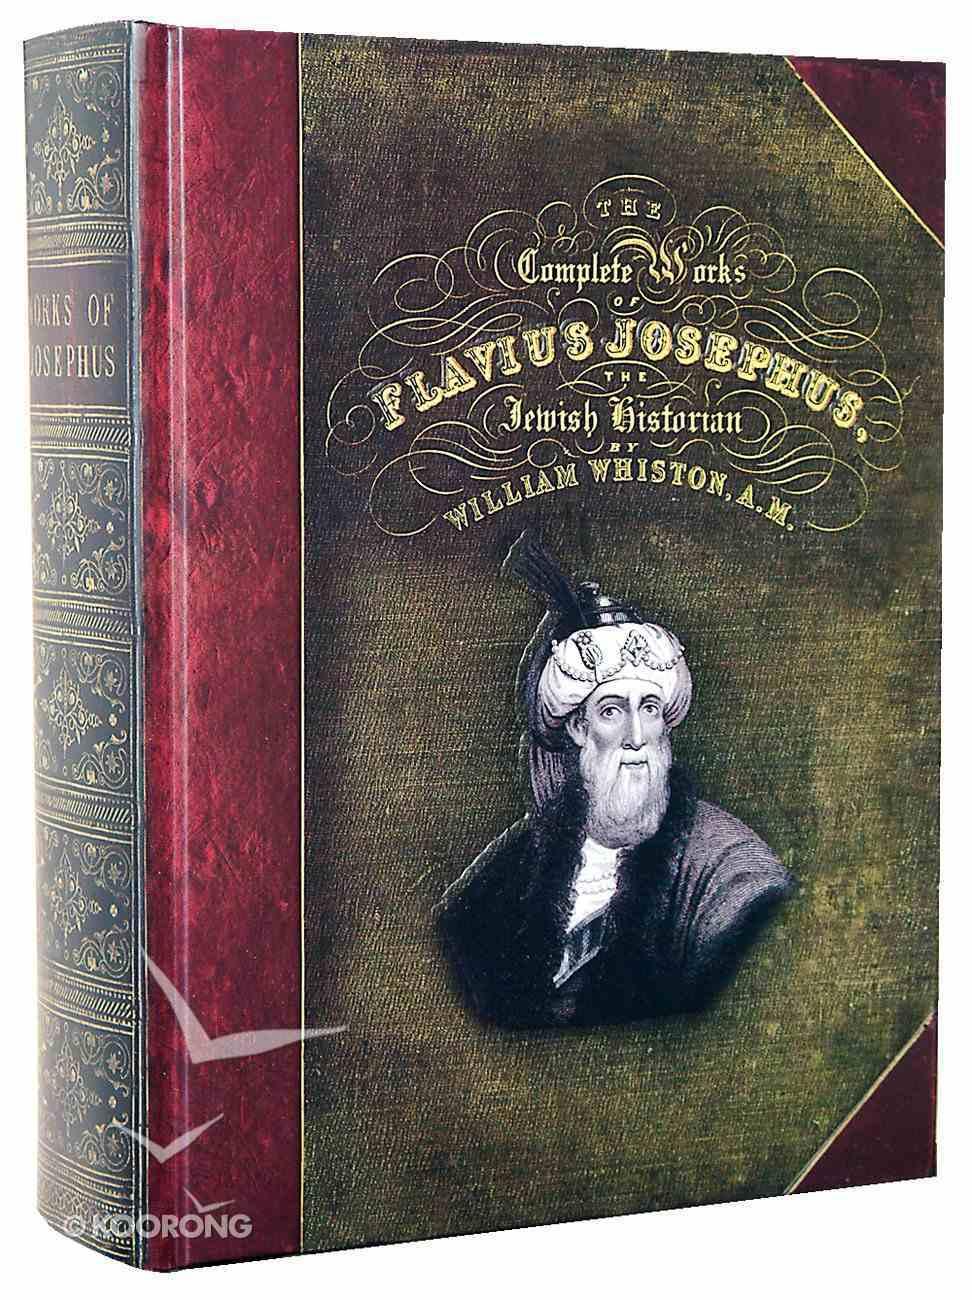 The Complete Works of Flavius Josephus Hardback